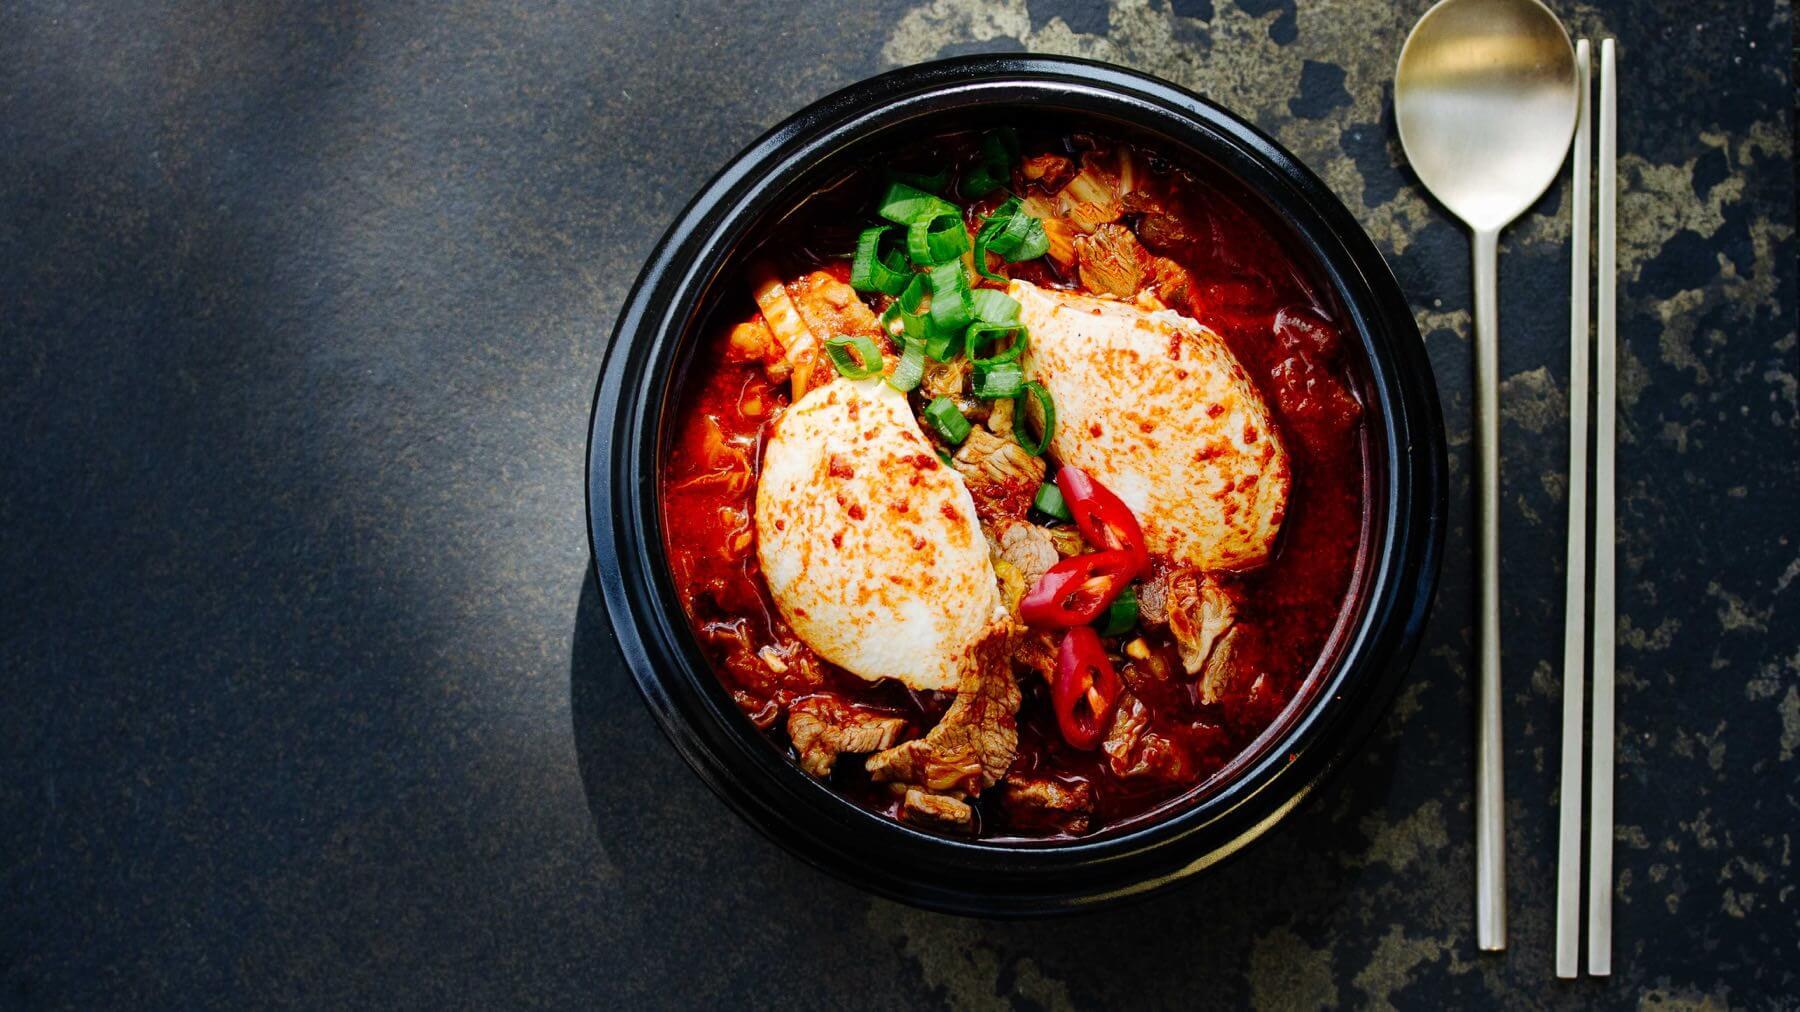 Scharfer Tofu Eintopf mit Kimchi aus Korea – Sundubu Jjigae